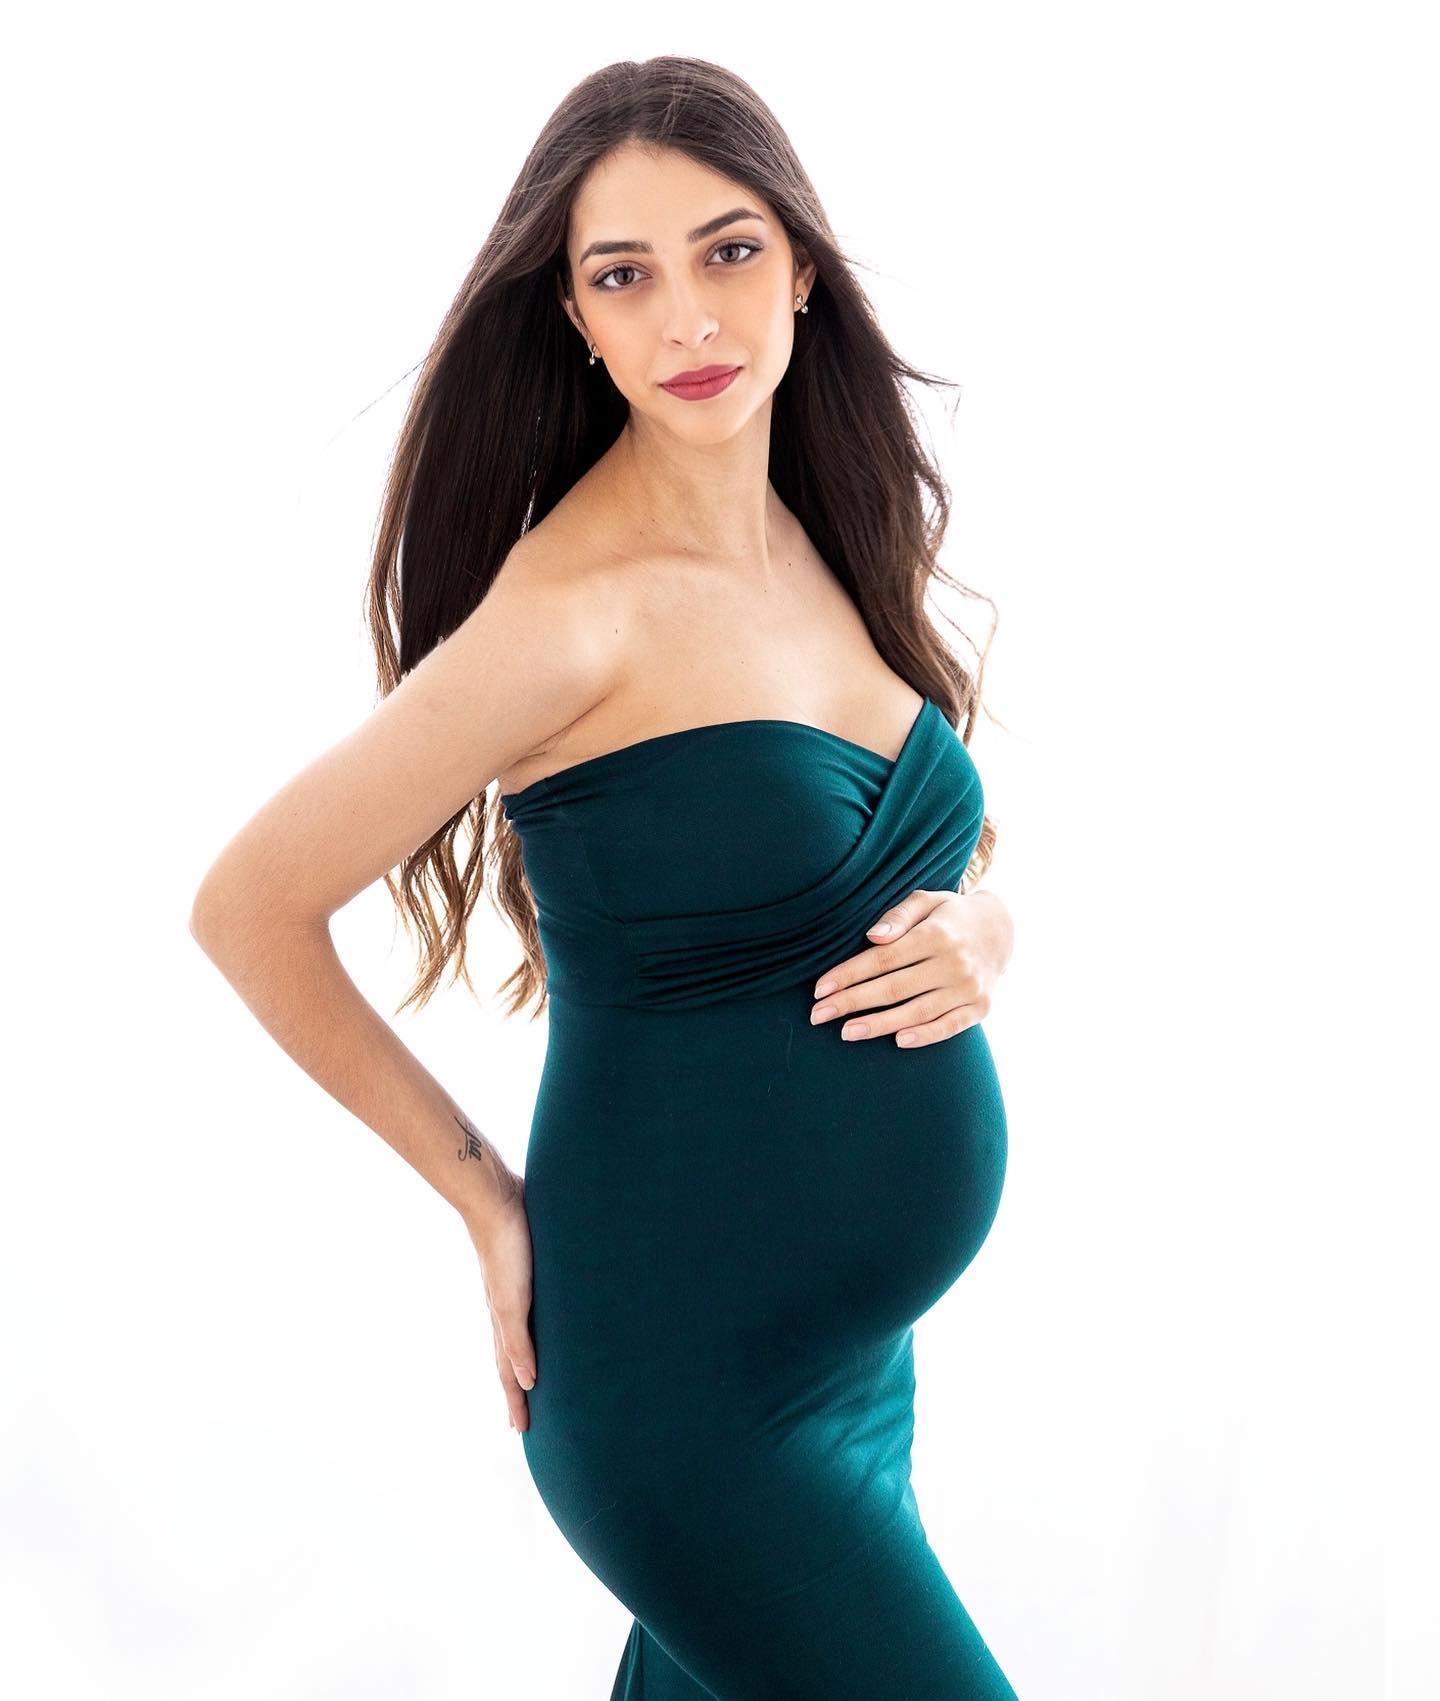 97036588 2972802579466602 4988126759321862144 o - Maternity Workshop